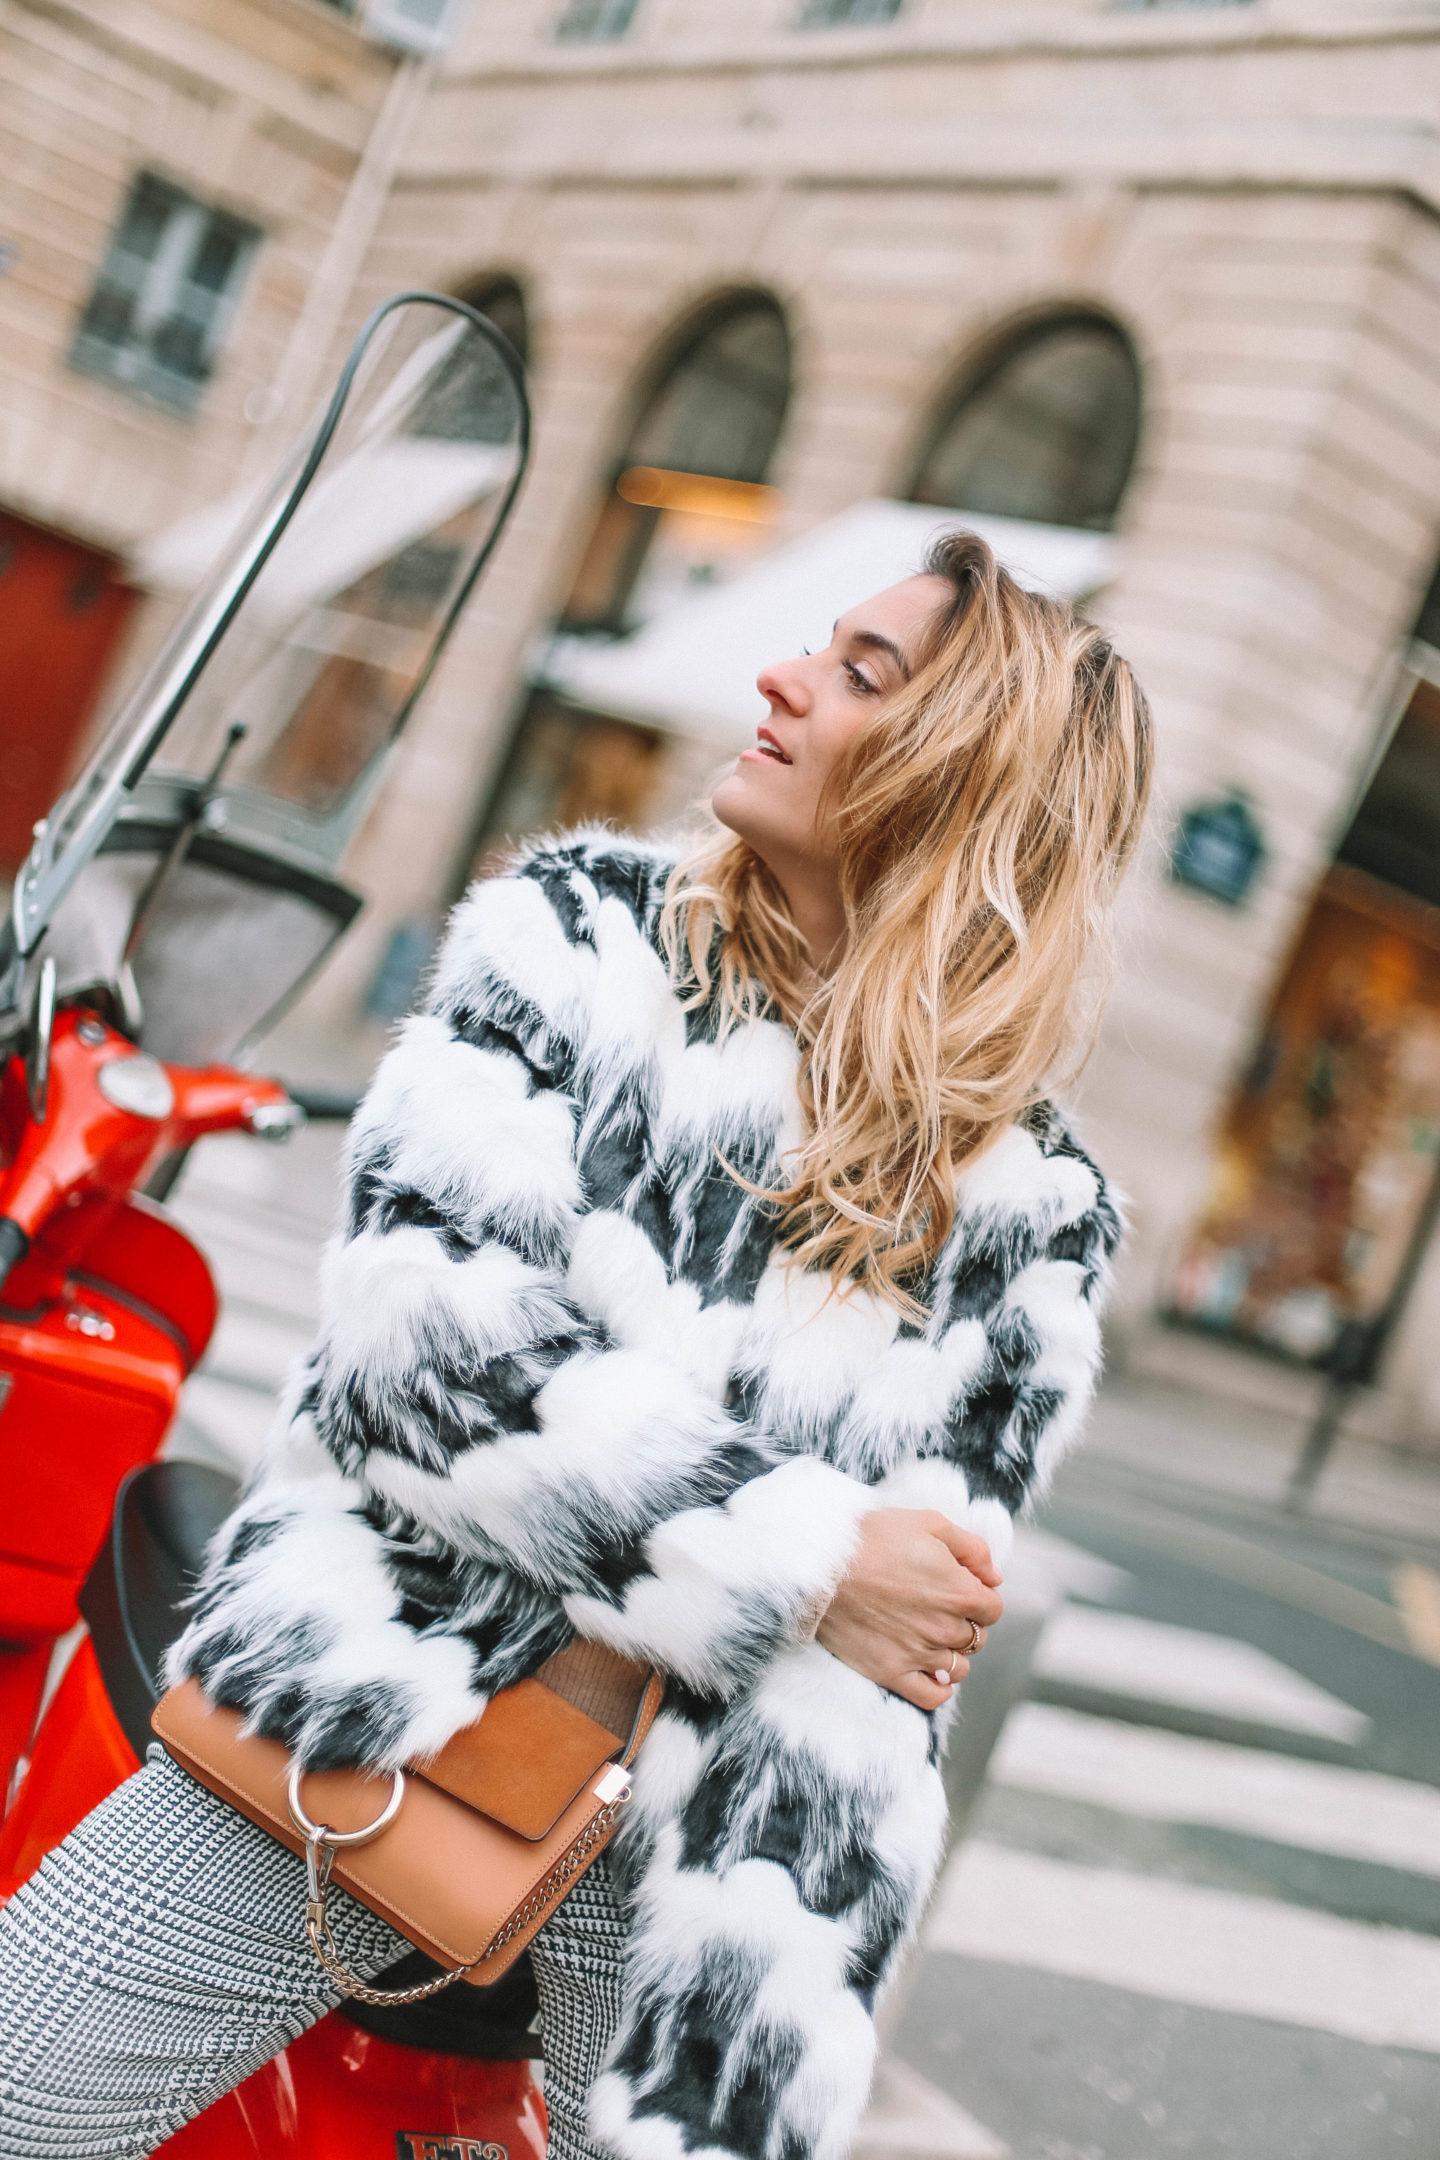 GHD creative Curl - Blondie baby blog mode et voyages